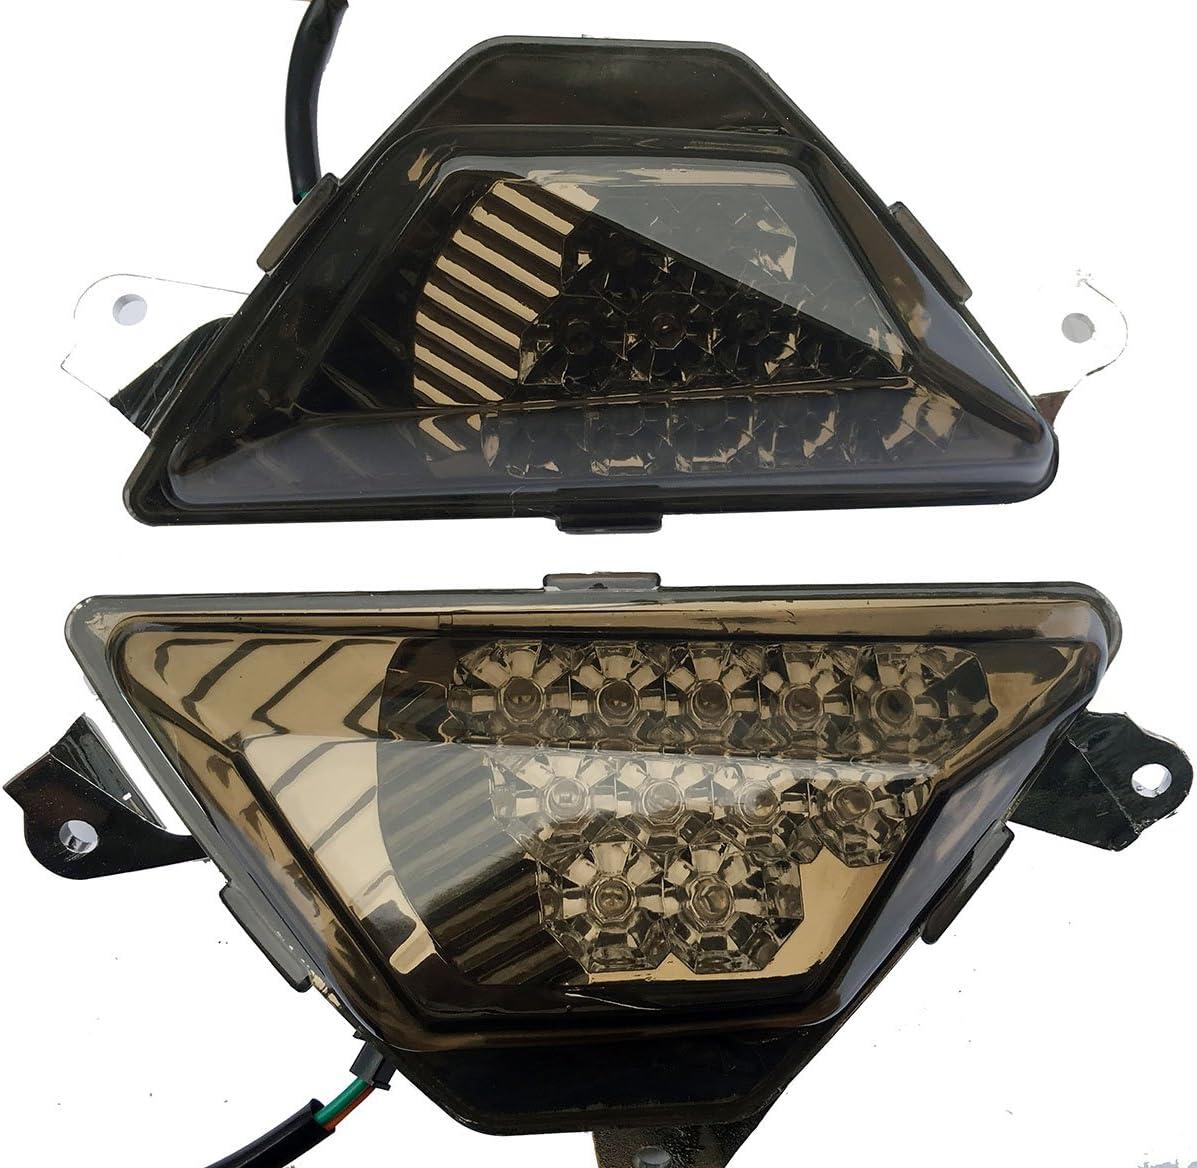 Front Smoke LED Turn Signal Lights Blinkers Indicators for 2016 Kawasaki Ninja 650 EX650 ABS